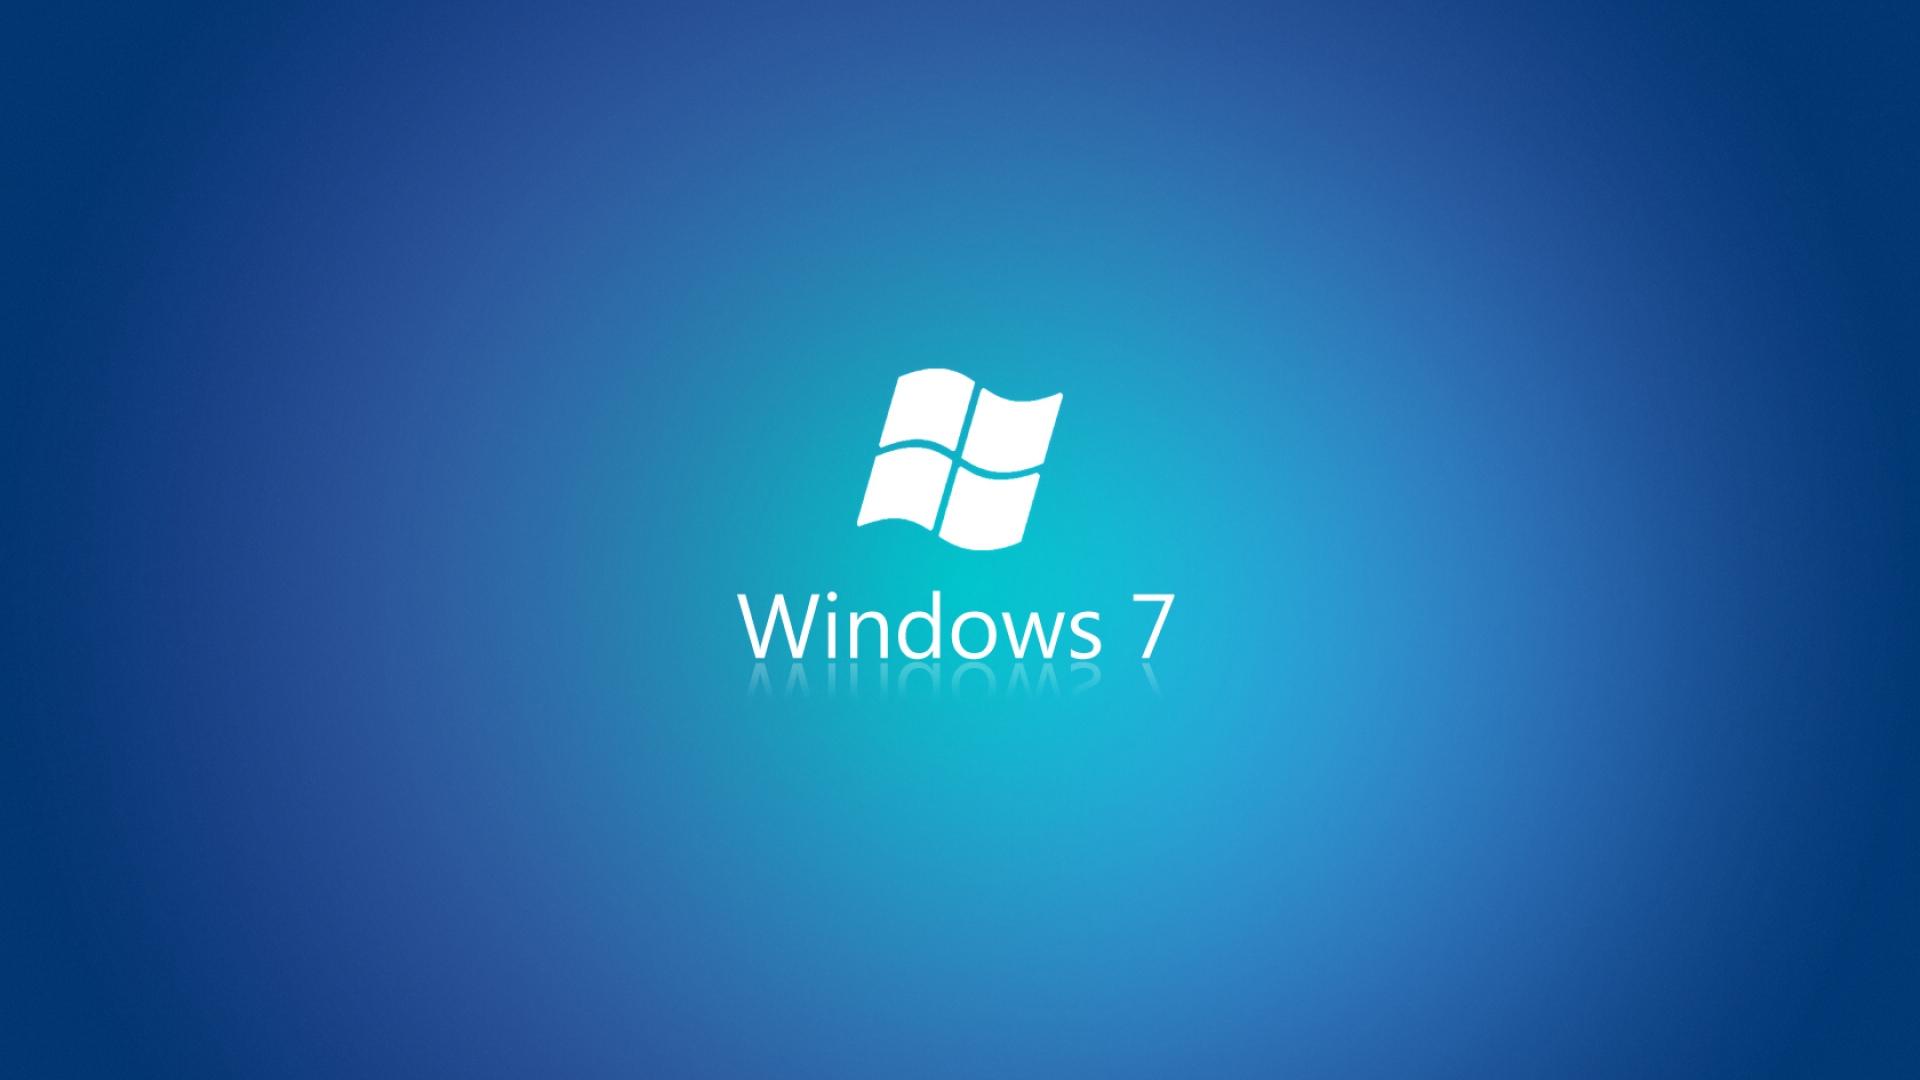 Download windows 7 logo wallpaper HD wallpaper 1920x1080